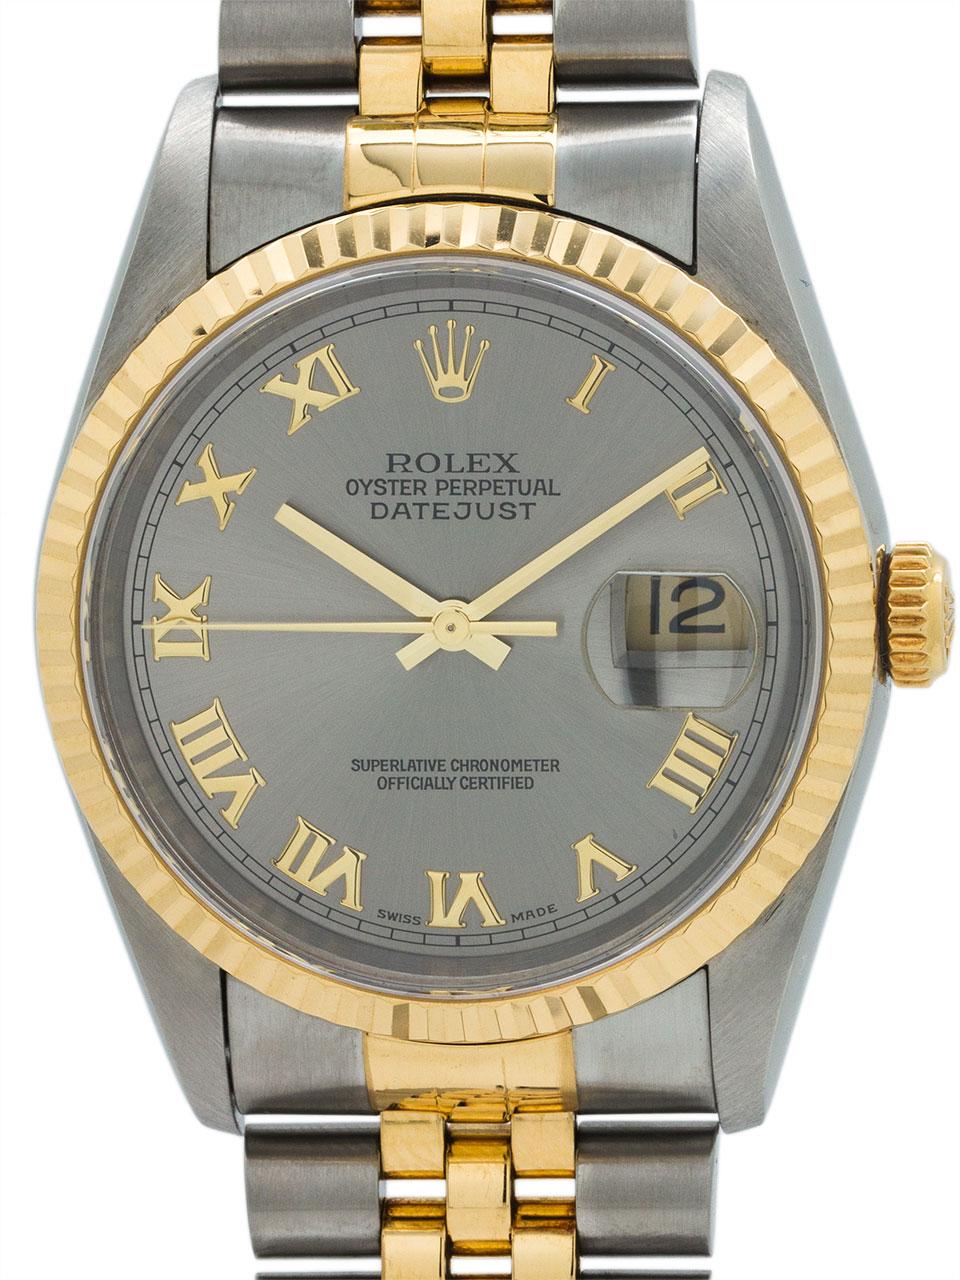 Rolex Datejust ref 16233 SS/18K Roman Rodium circa 1996